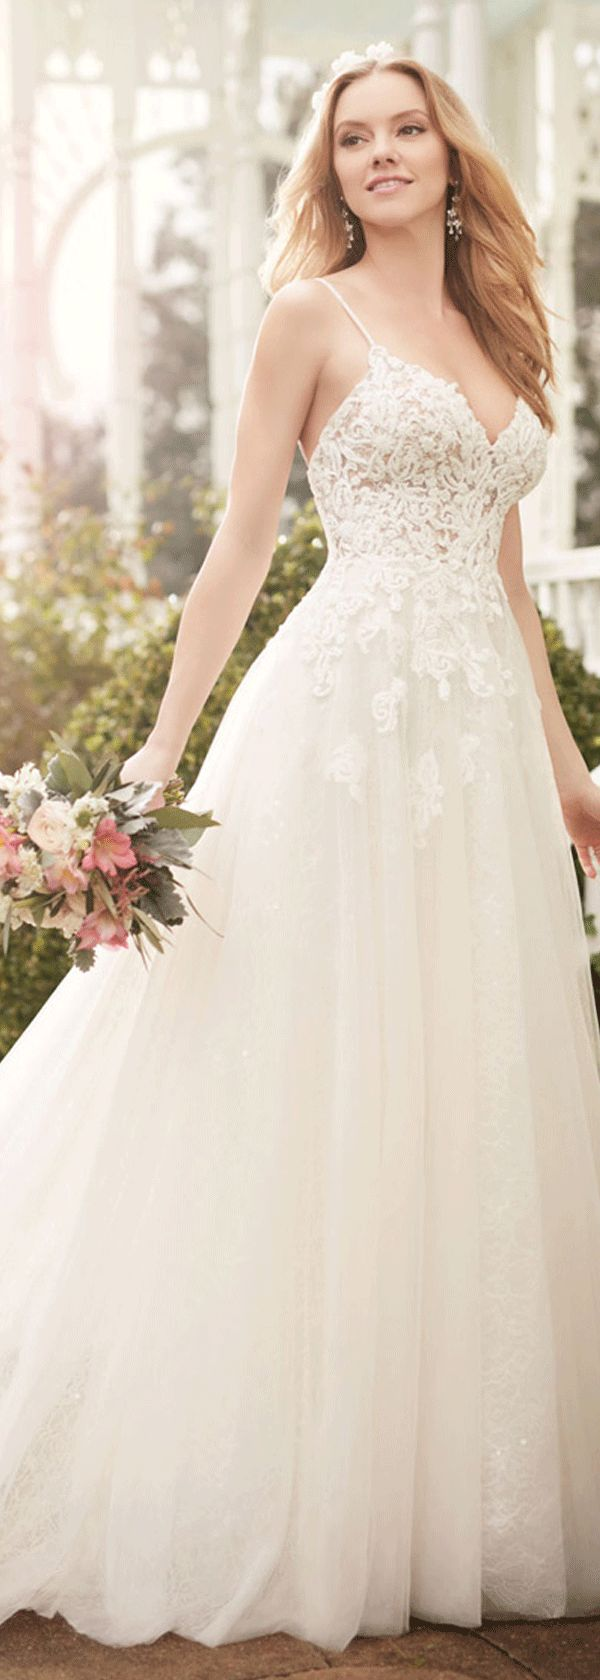 hawaiian wedding dresses wedding dress with straps Wonderful Tulle Spaghetti Straps Neckline A line Wedding Dresses With Lace Appliques